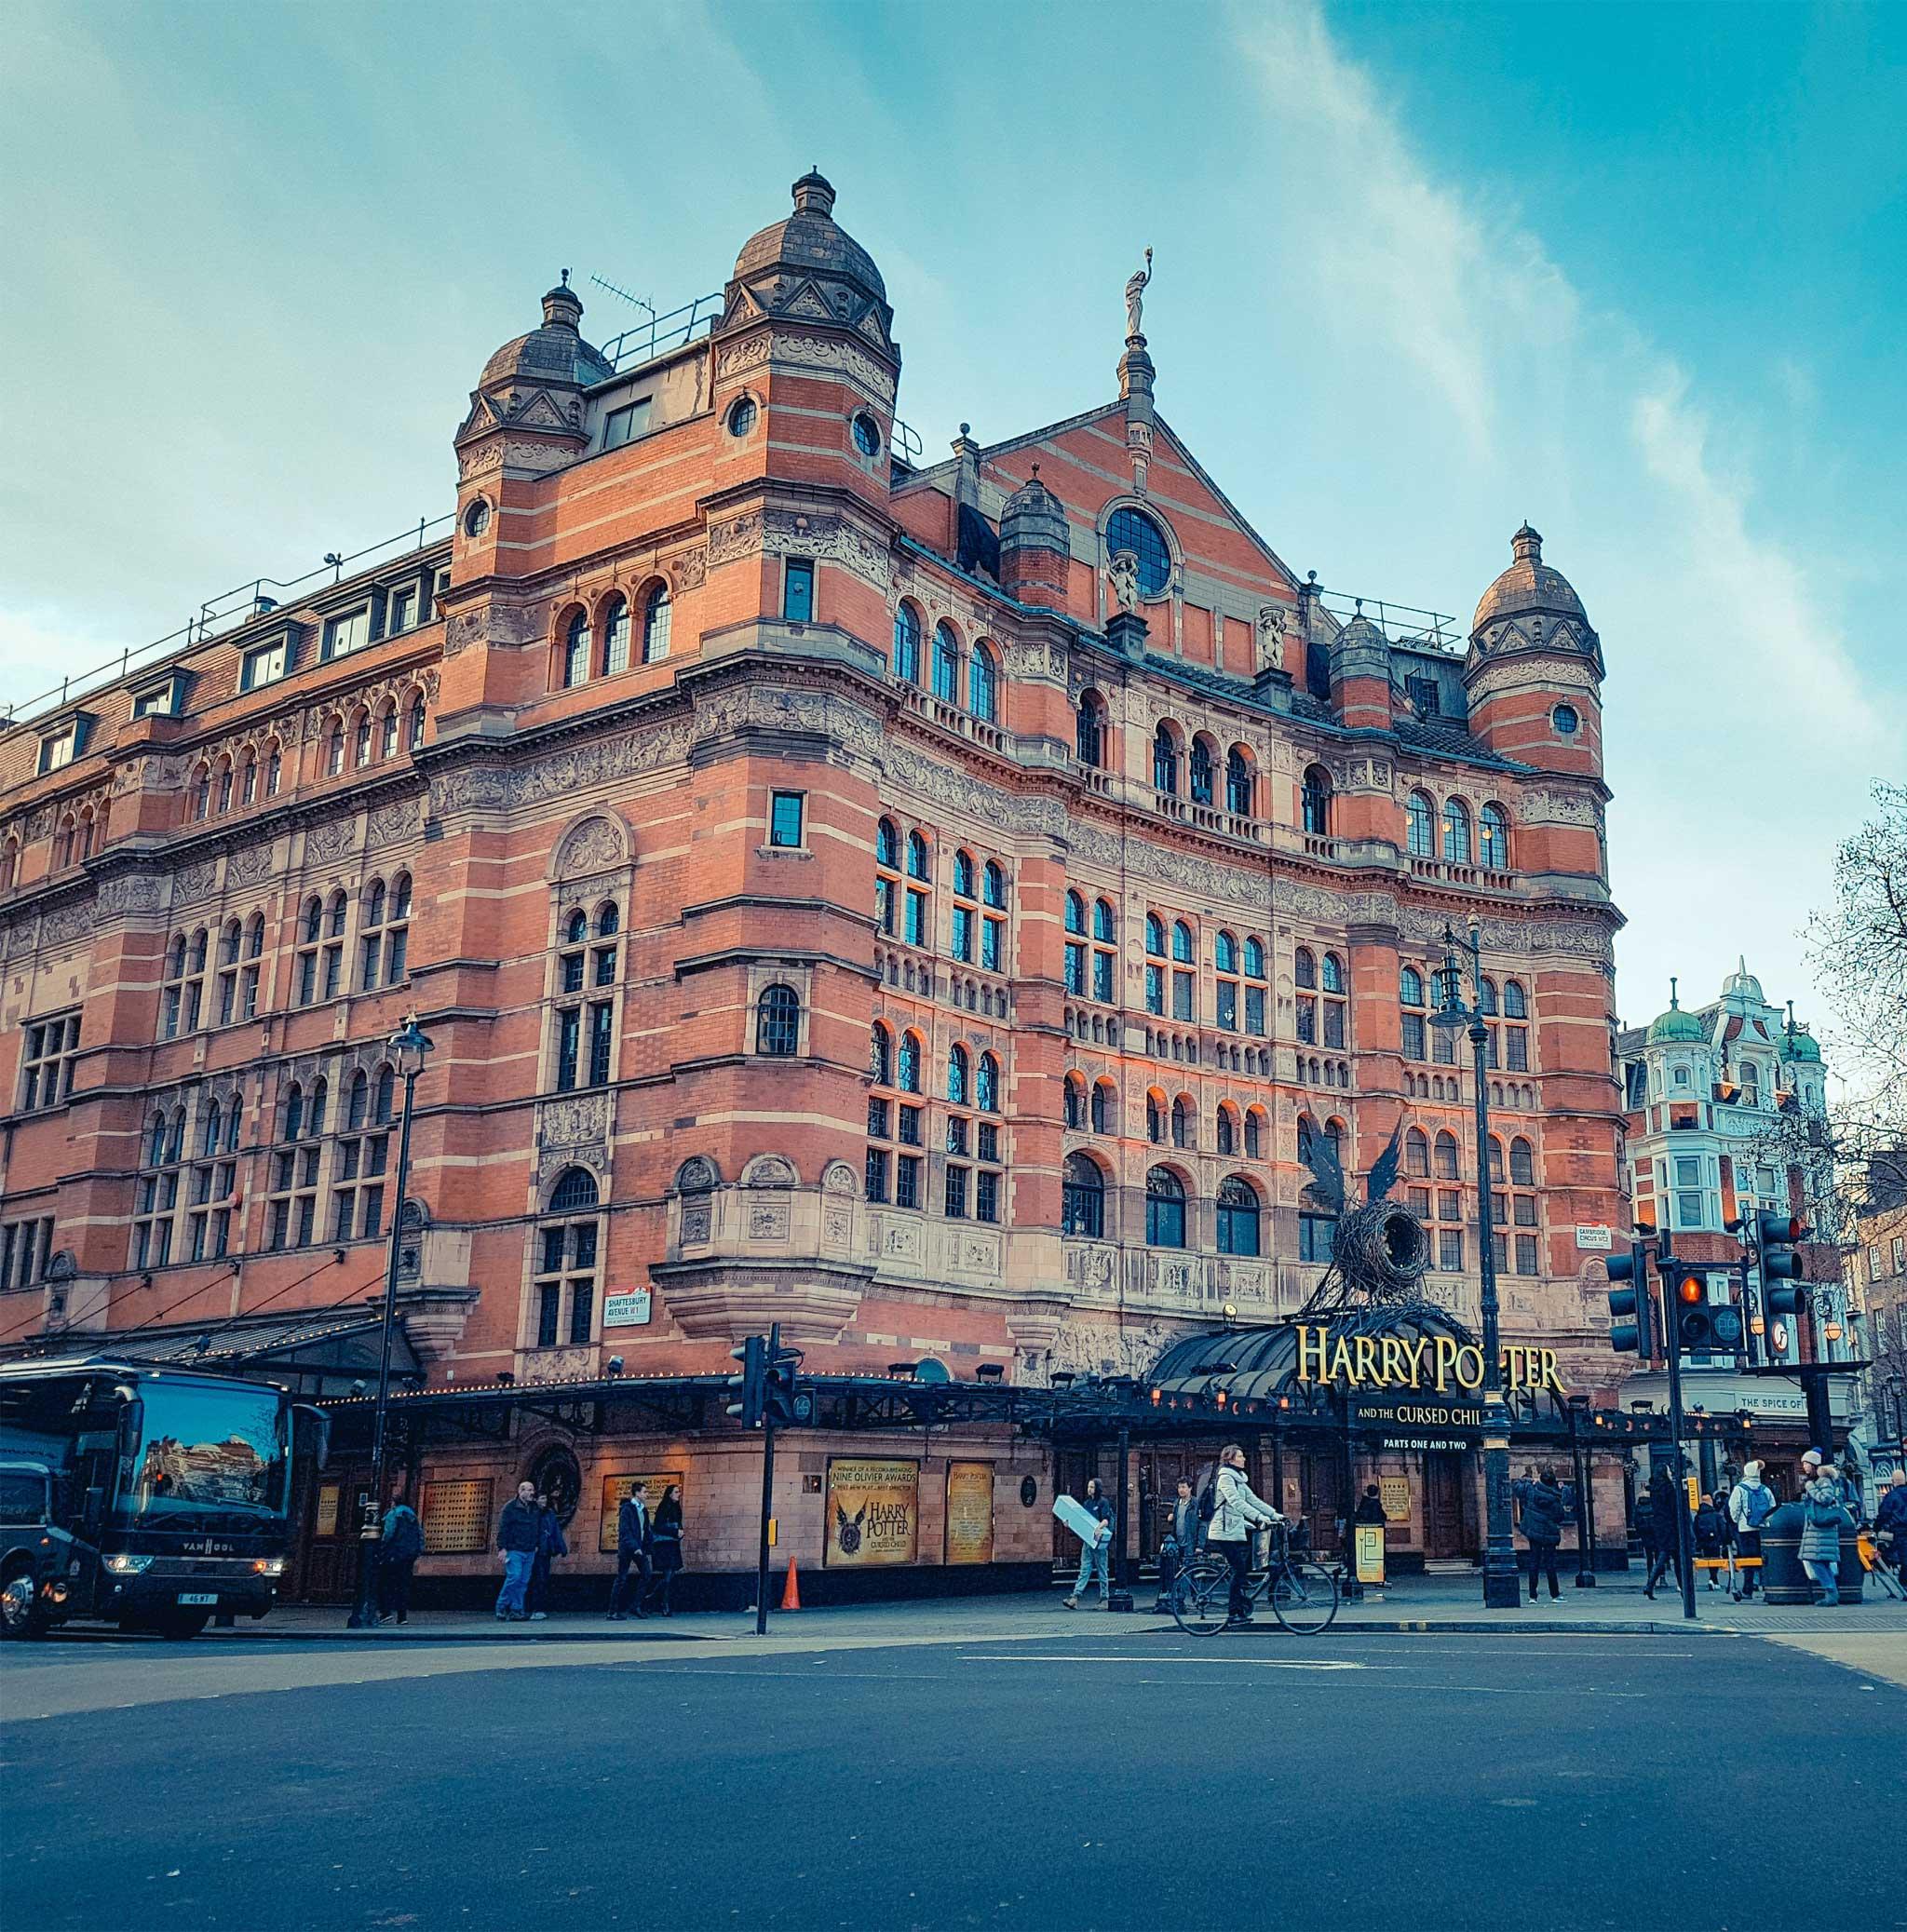 Palace Theatre on London audio tour Theatreland Tour with Ian McKellen